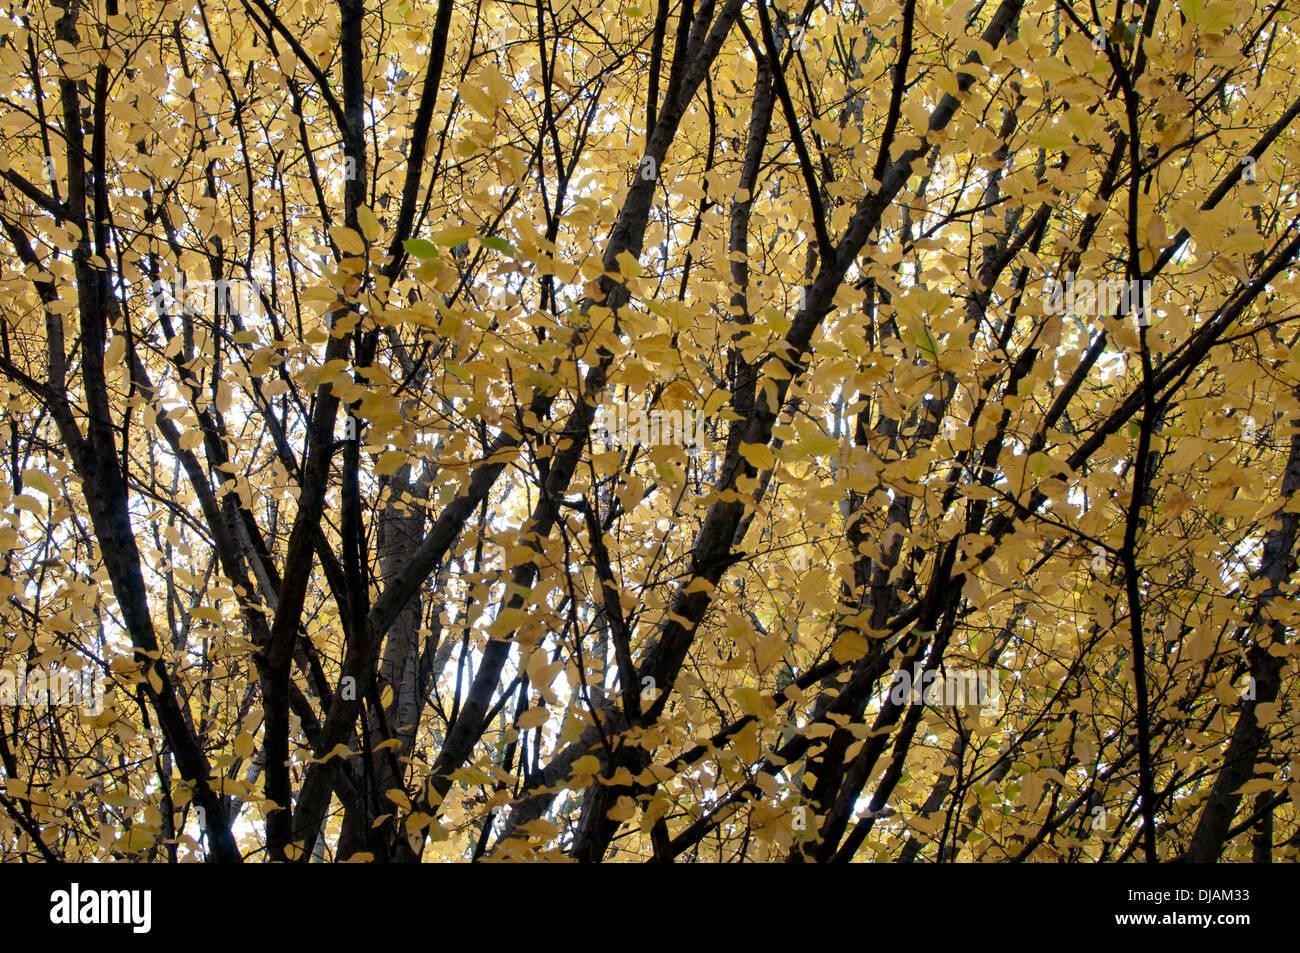 Hornbeam tree (Carpinus betulus) in autumn, Jephson Gardens, Leamington Spa, UK - Stock Image